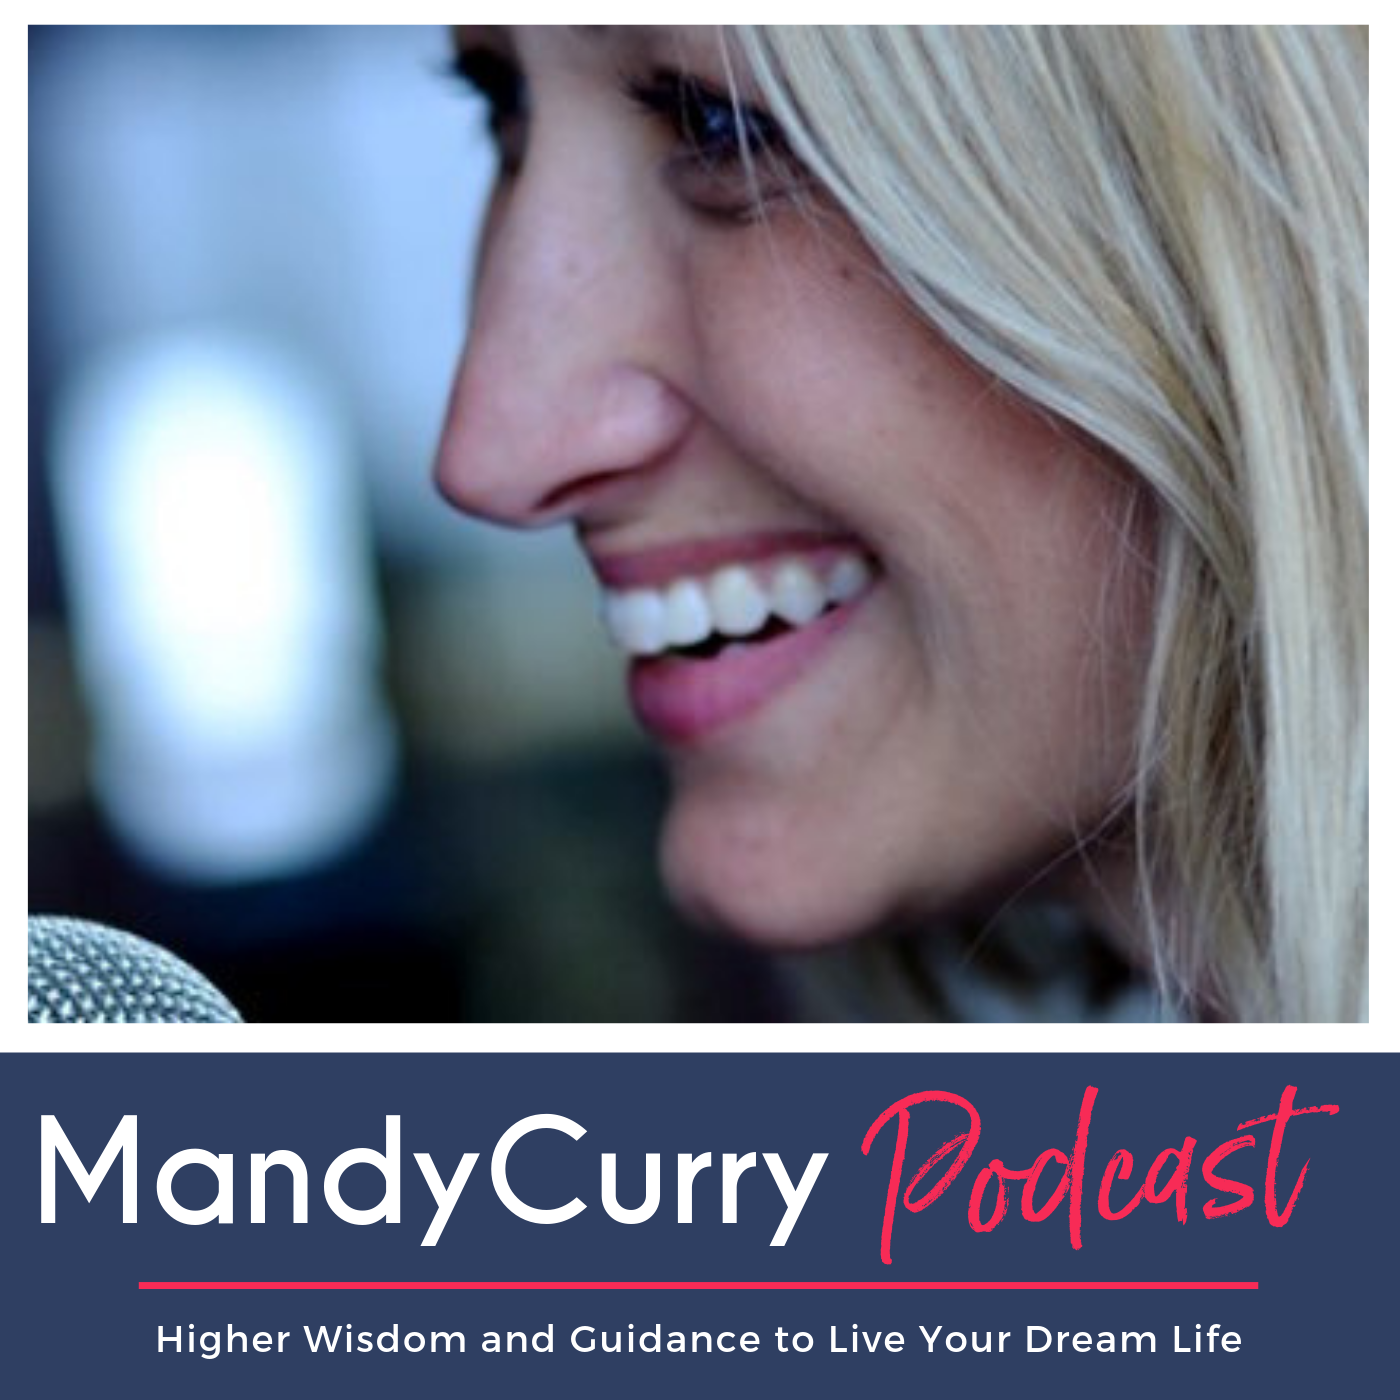 Mandy Curry Podcast show art